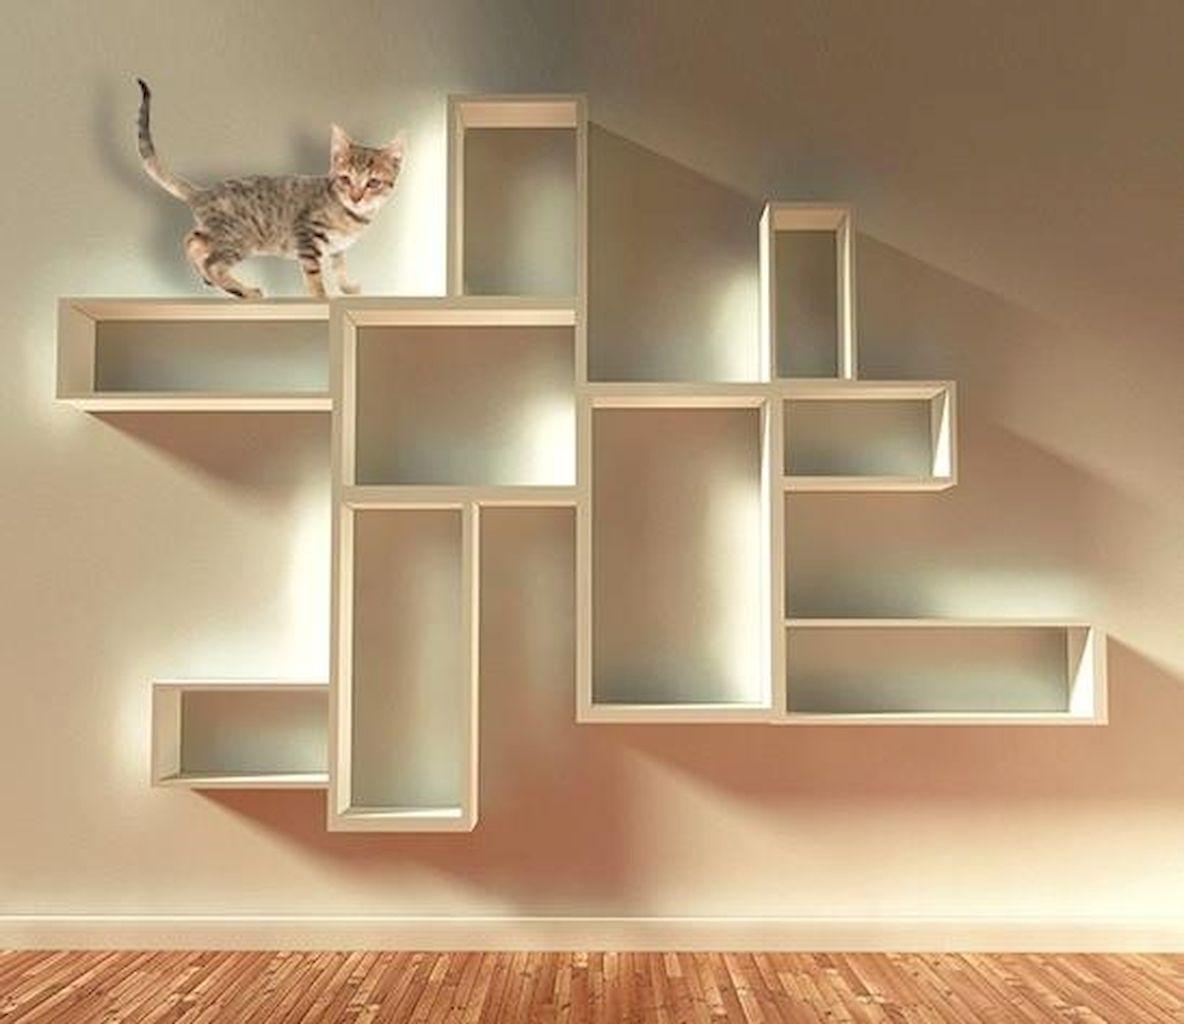 Adorable 60 cheap diy wall shelves floating ideas https